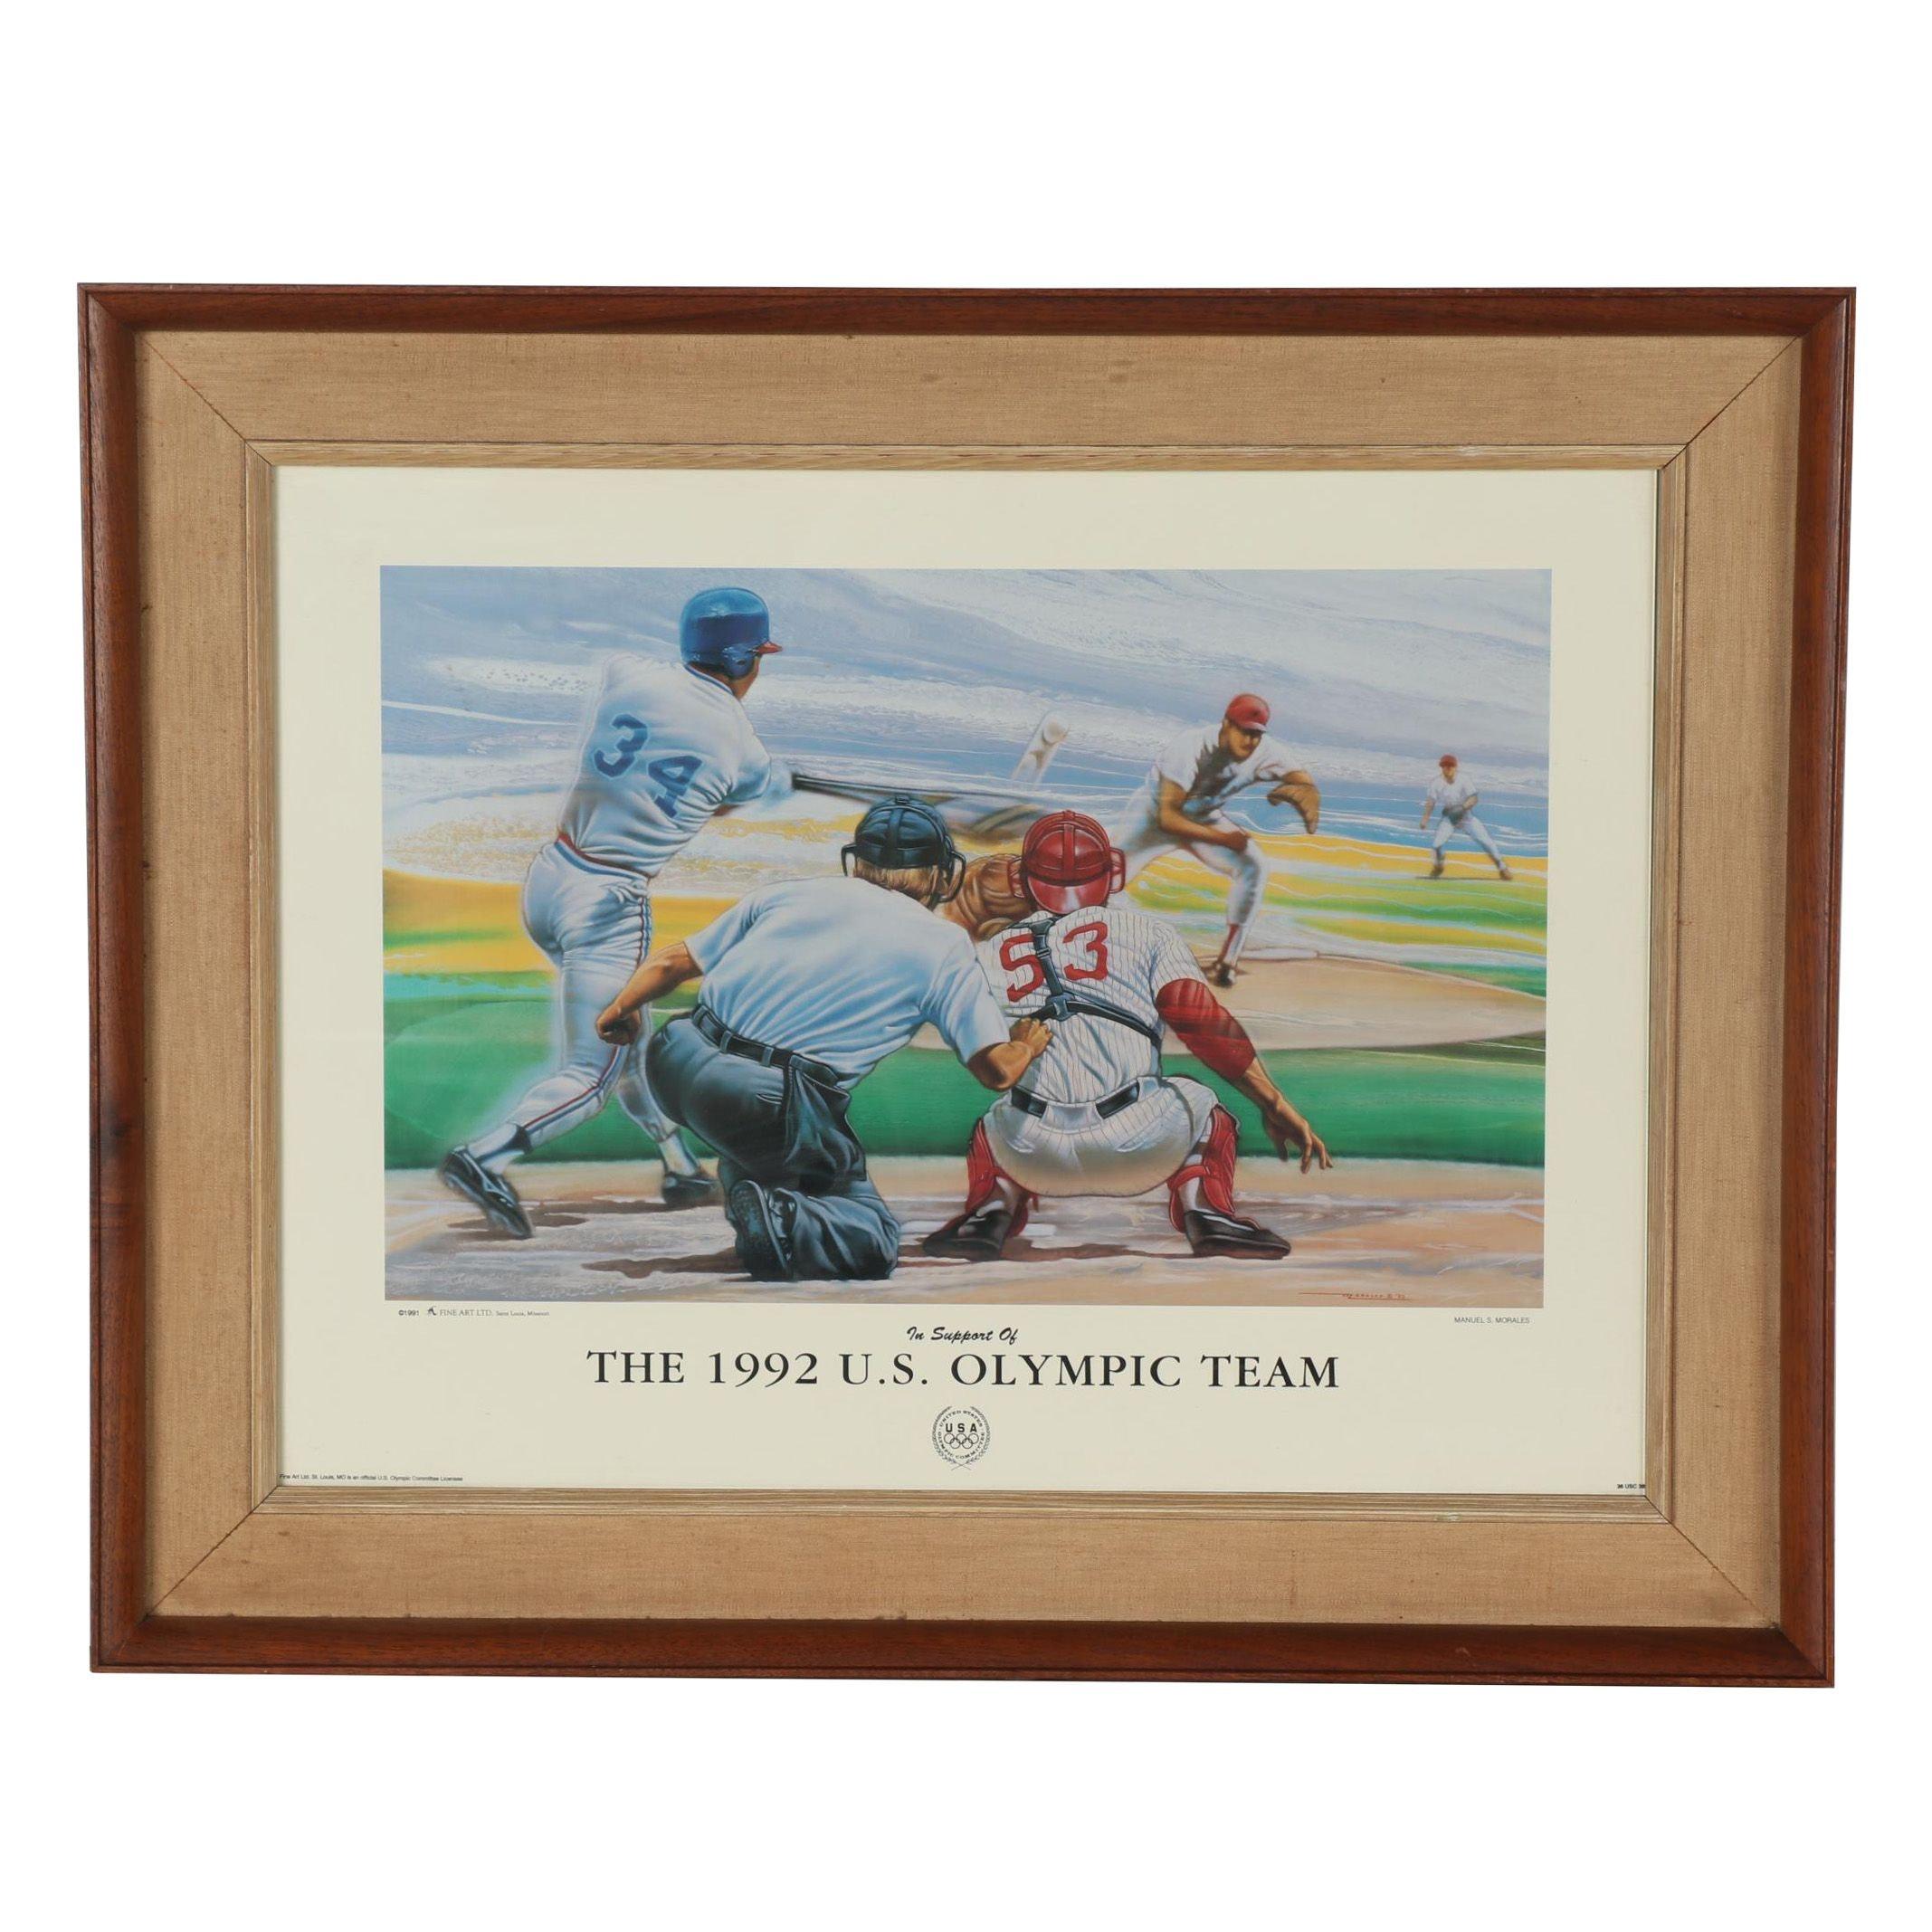 1992 U.S. Olympic Baseball Team Poster after Manuel Morales